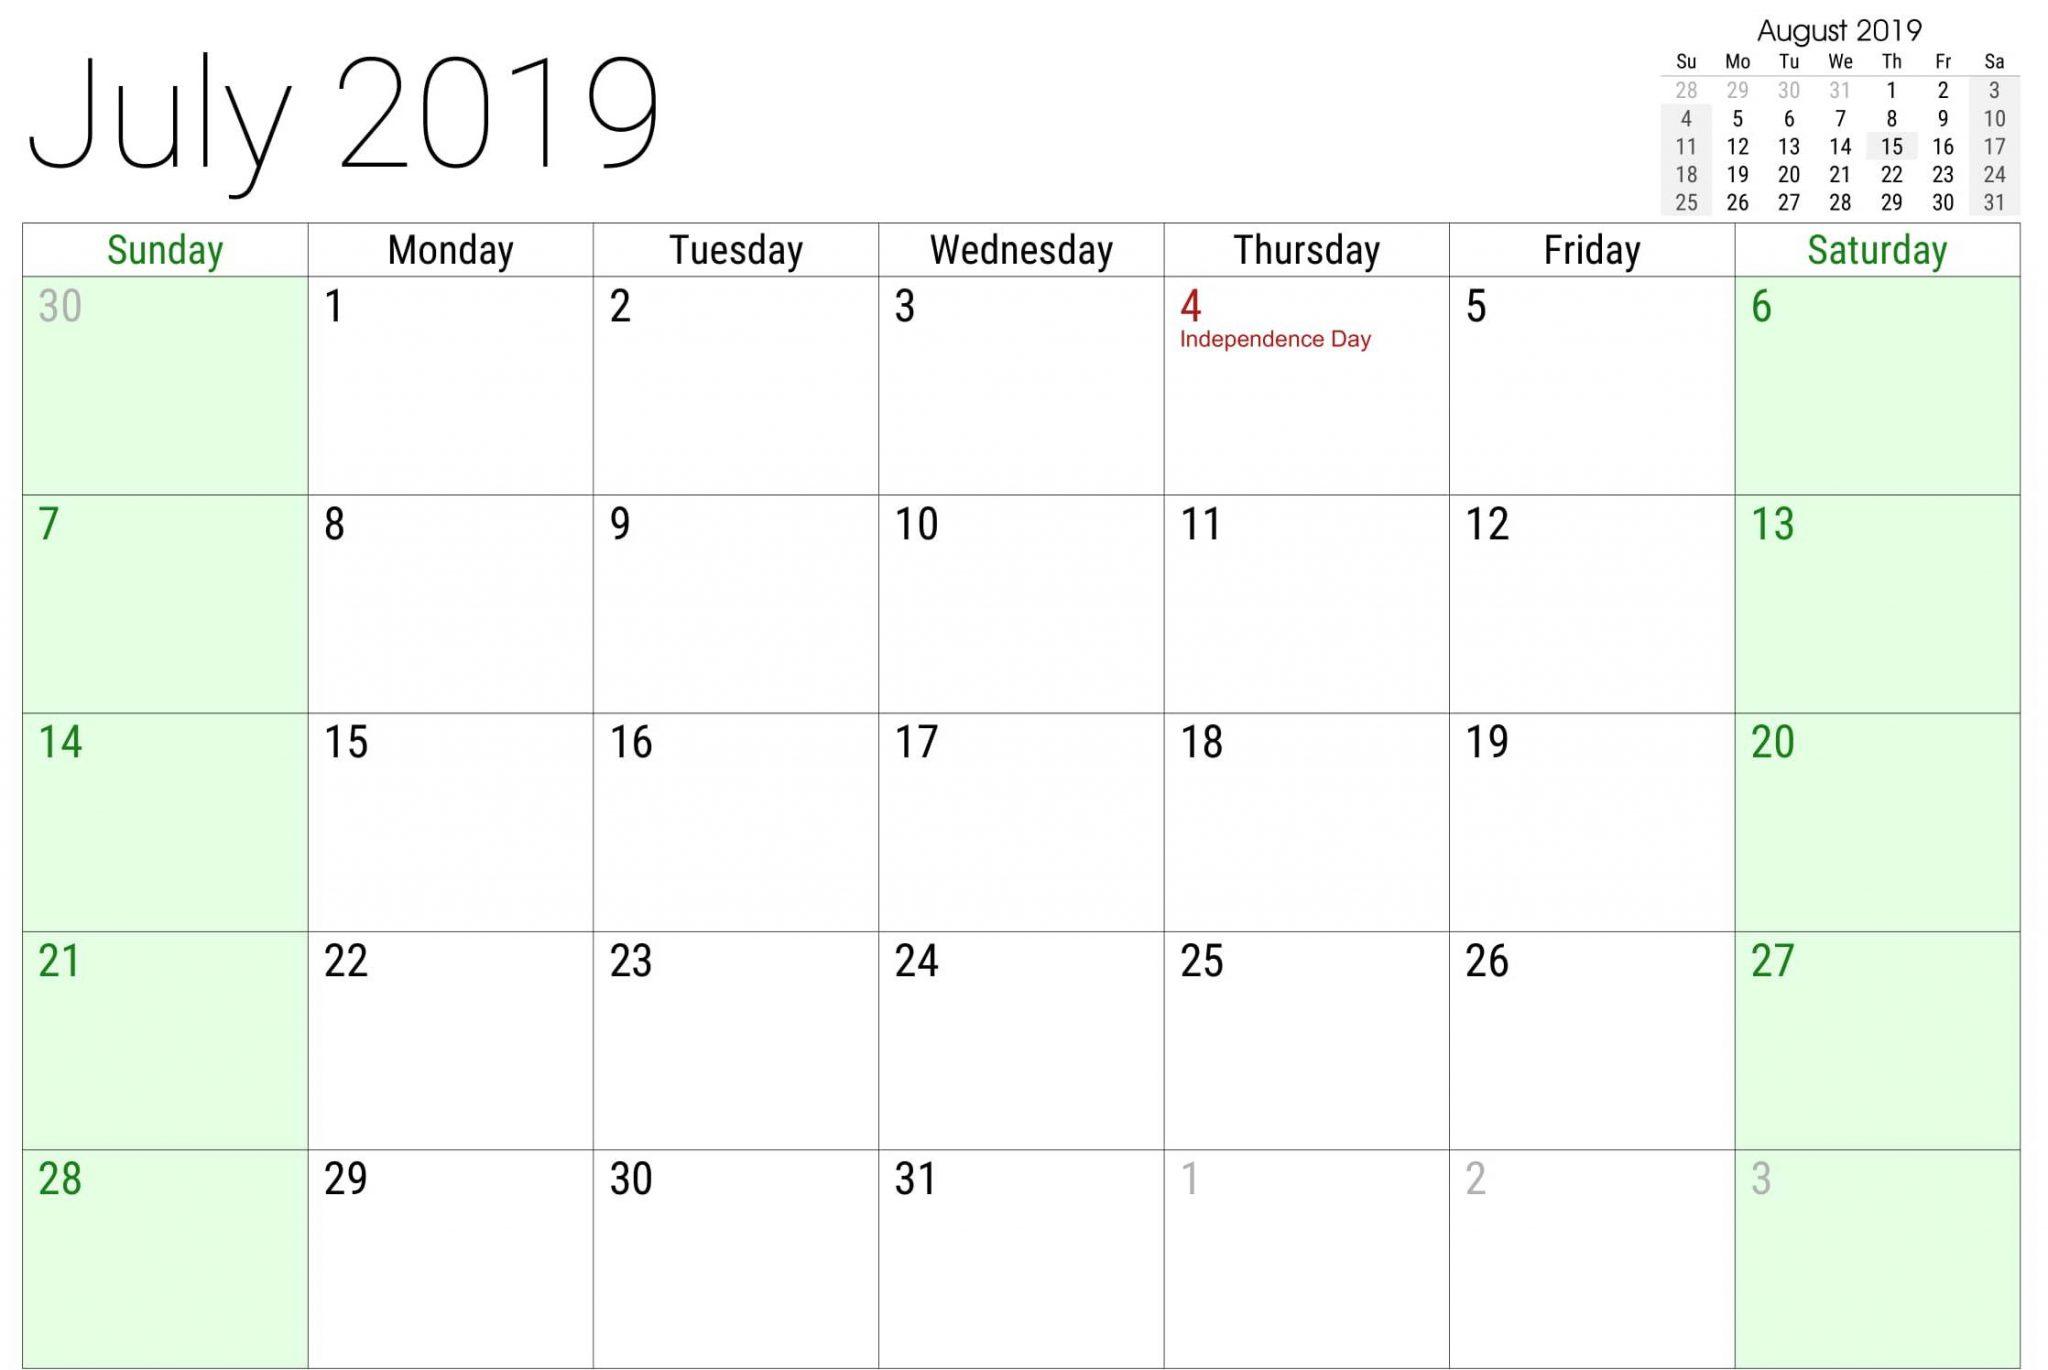 July 2019 USA Calendar